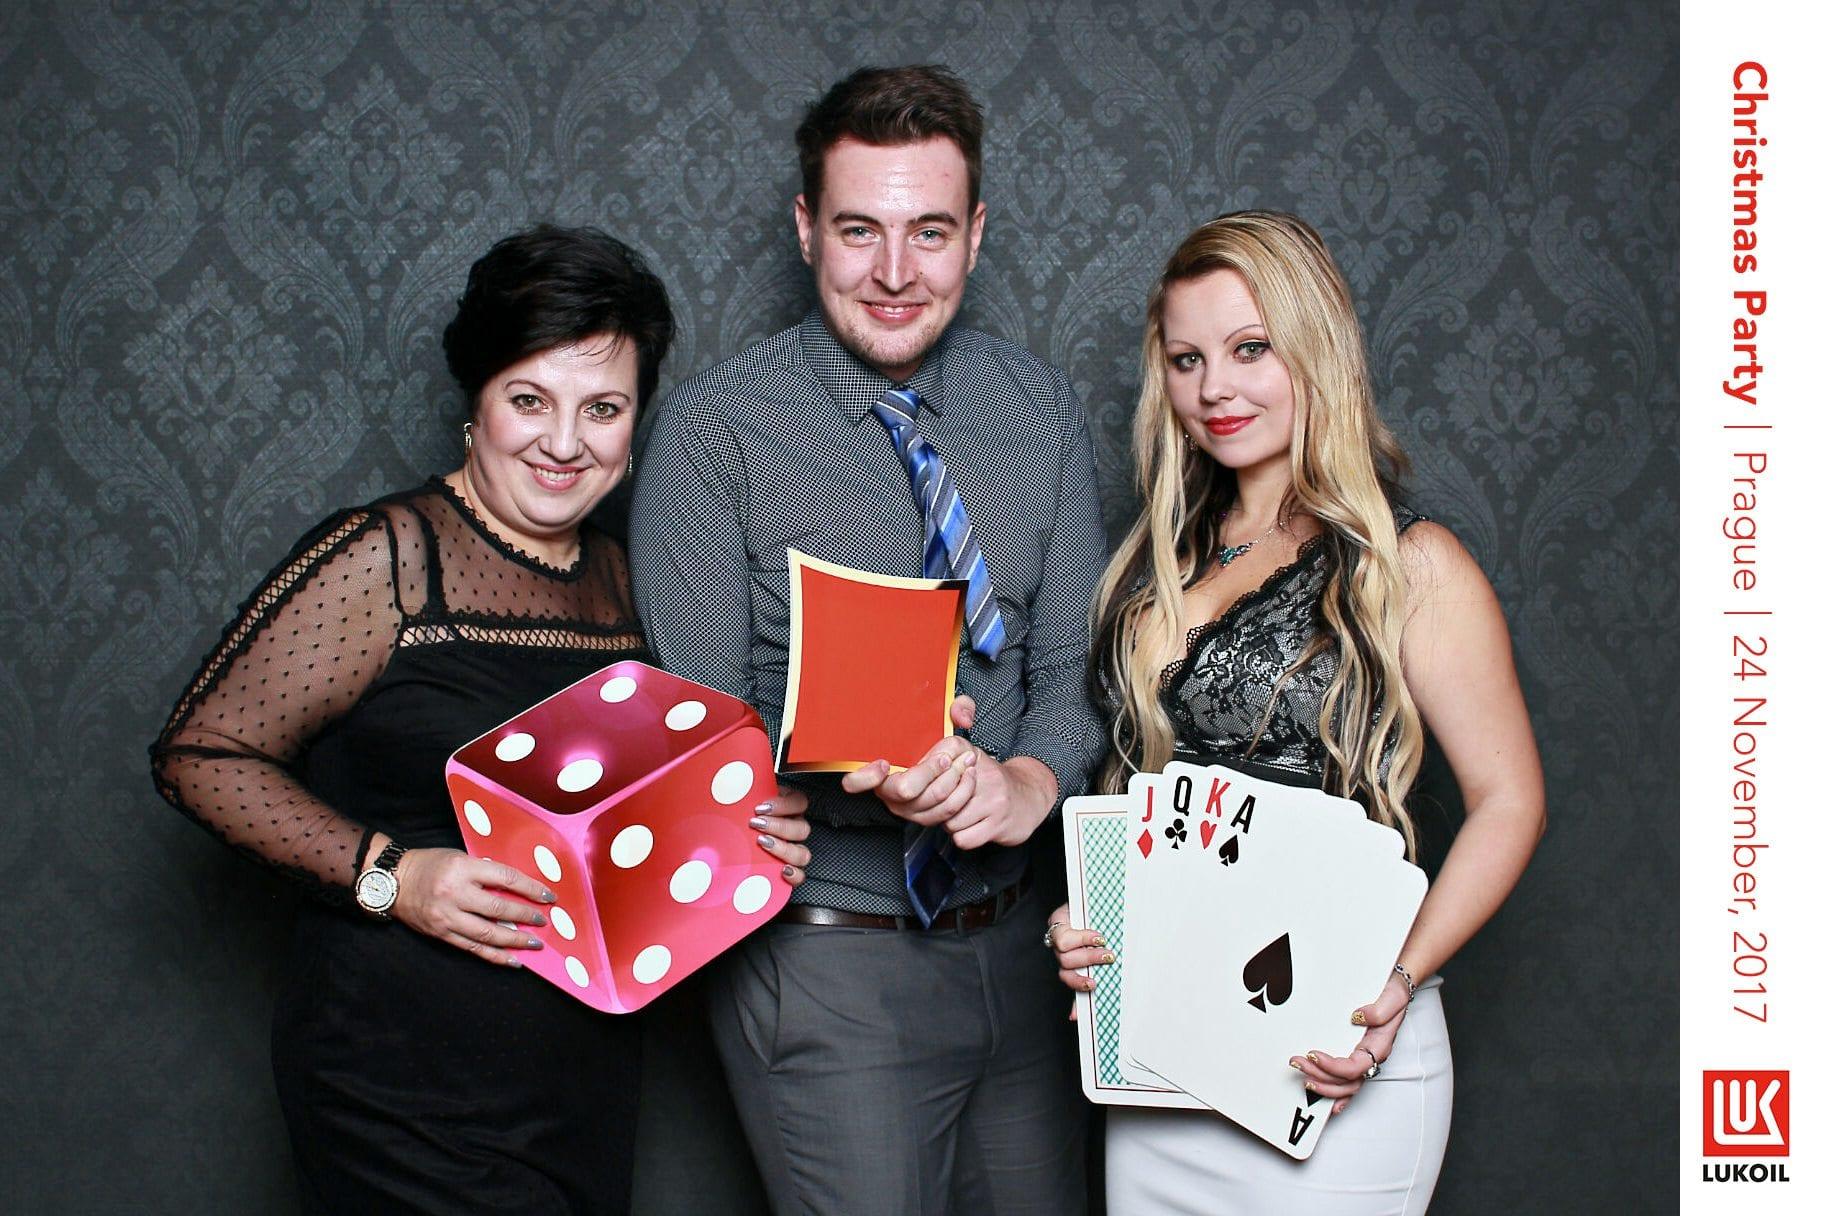 fotokoutek-lukoil-christmas-party-24-11-2017-338491